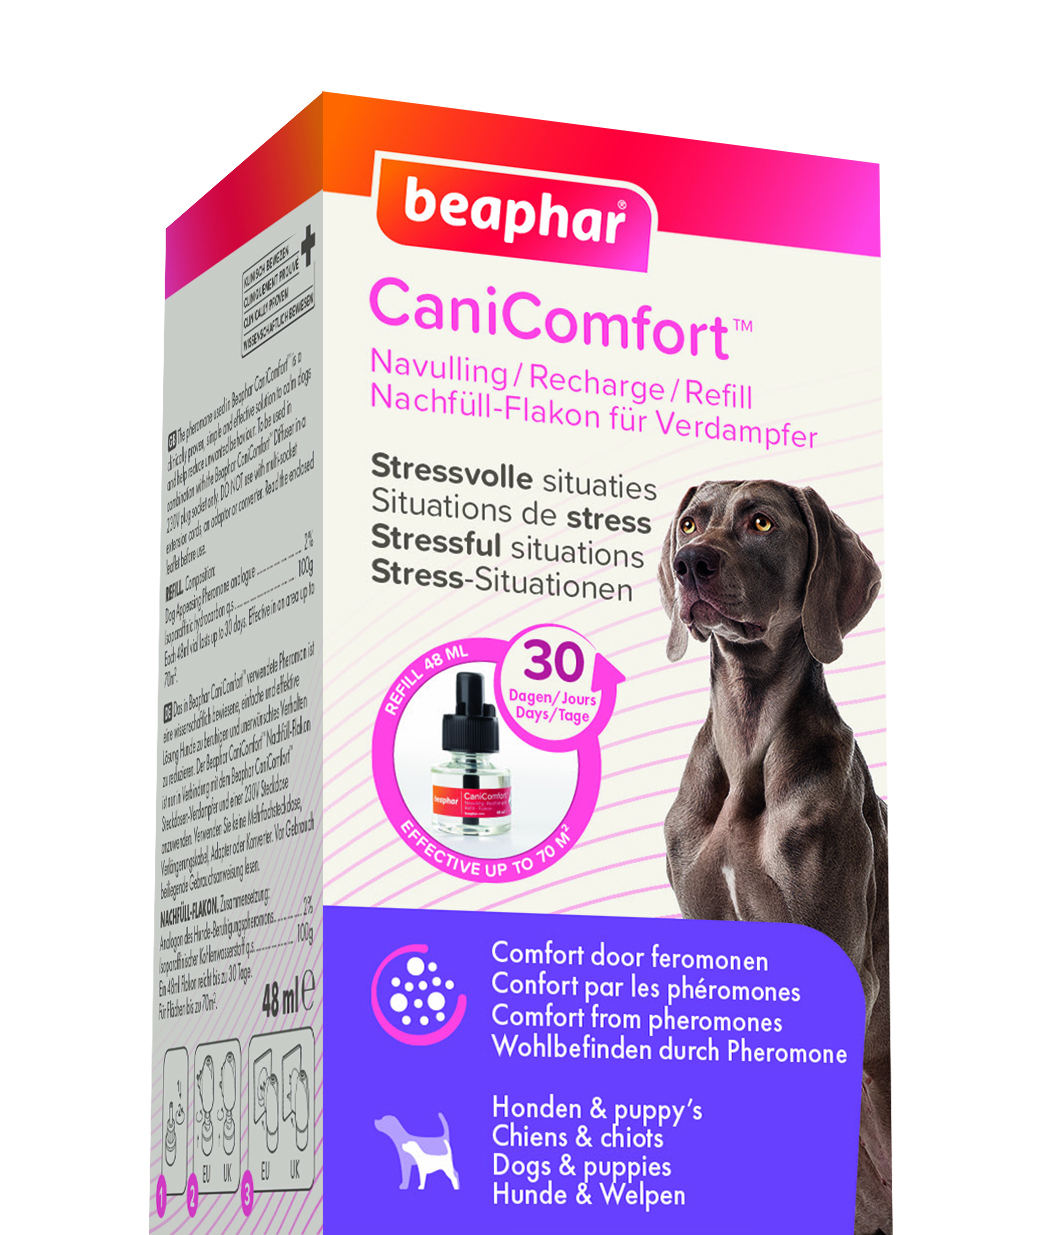 Canicomfort diffuser refill hund 48ml